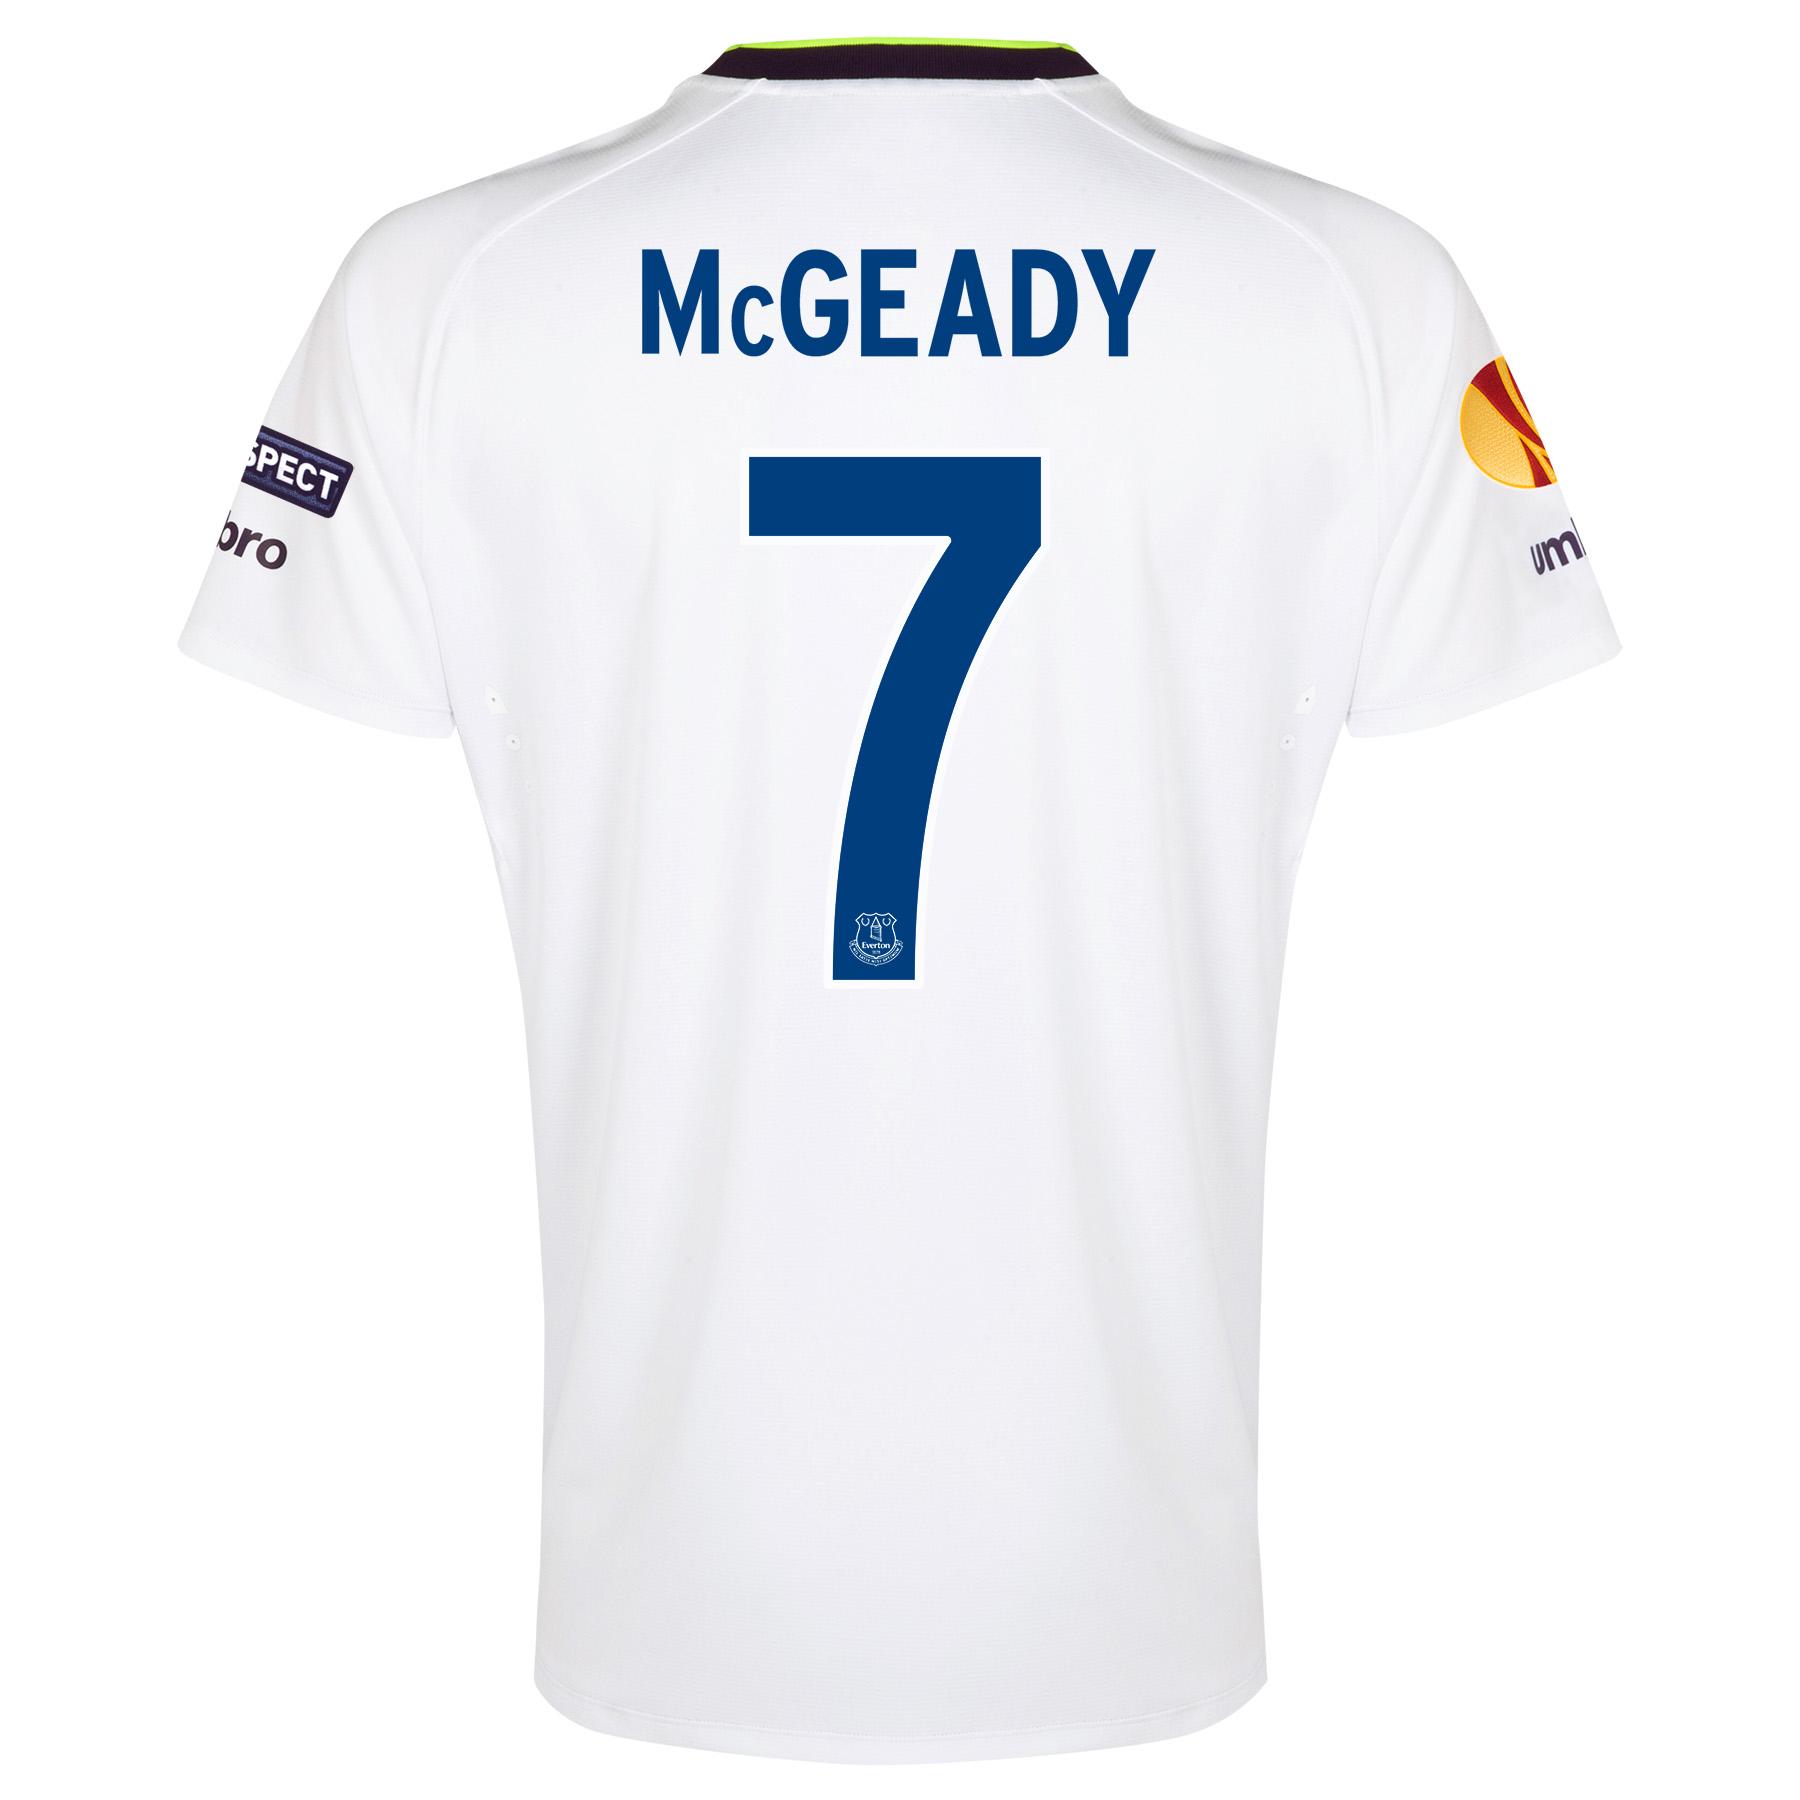 Everton UEFA Europa League 3rd Shirt 2014/15 with McGeady 7 printing